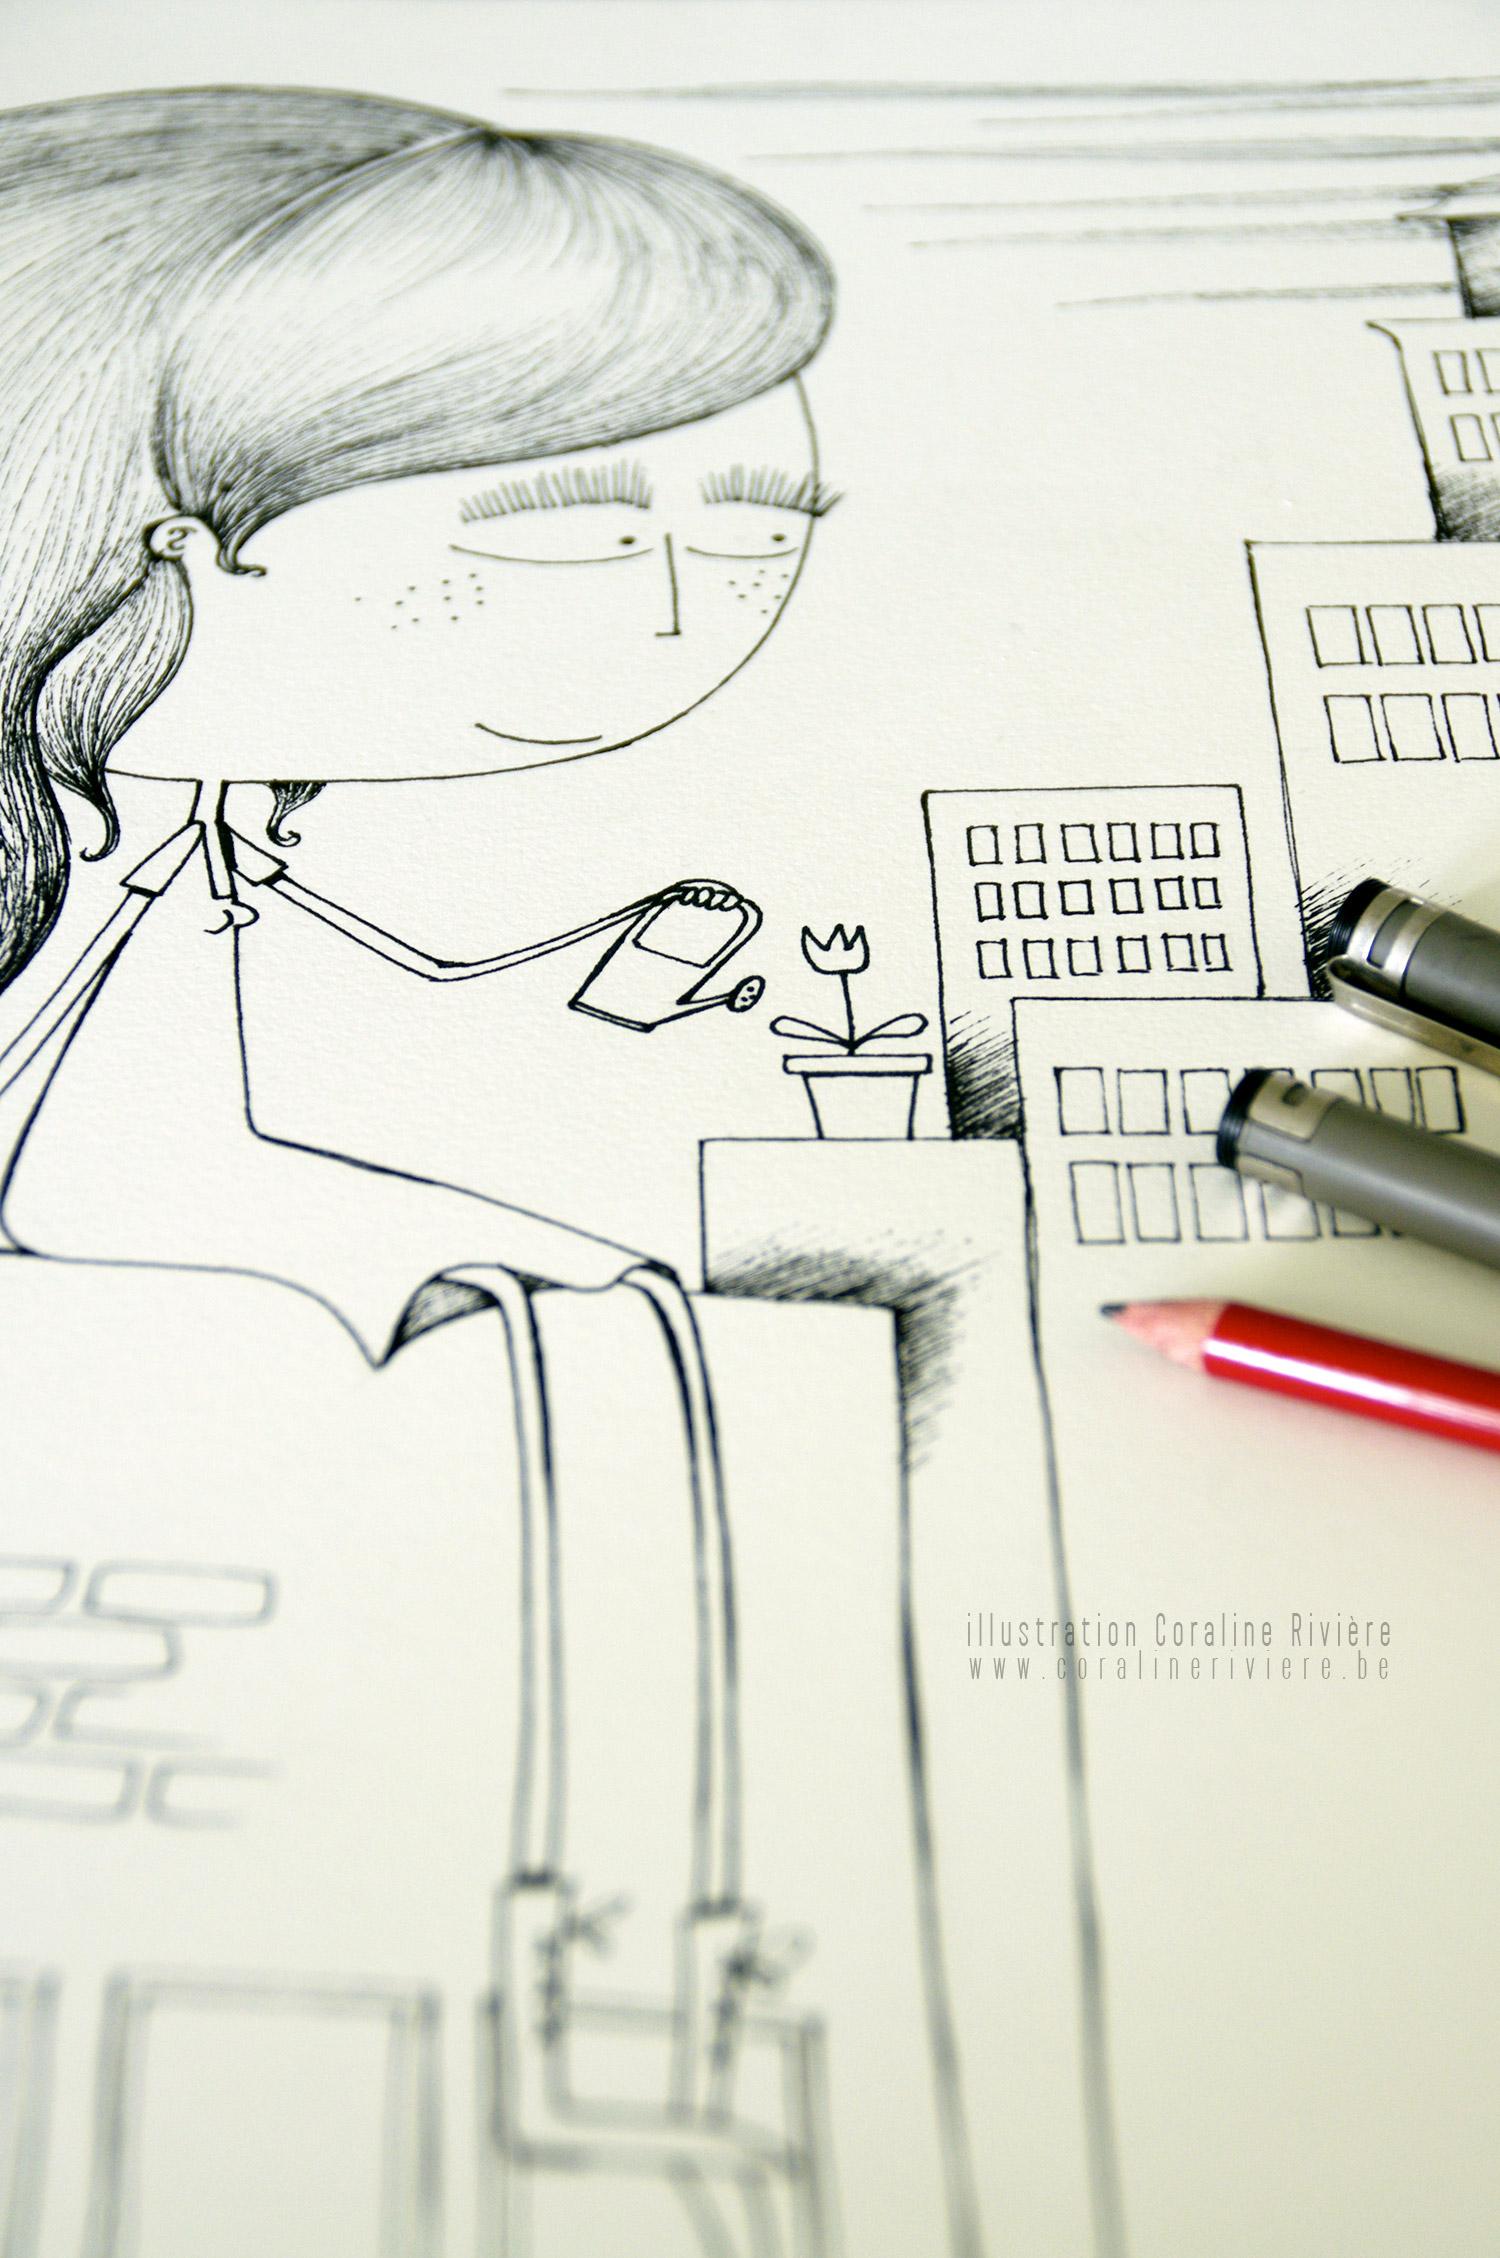 illustration fille sur les toits arroser plantes dessin poetique illustratrice belge